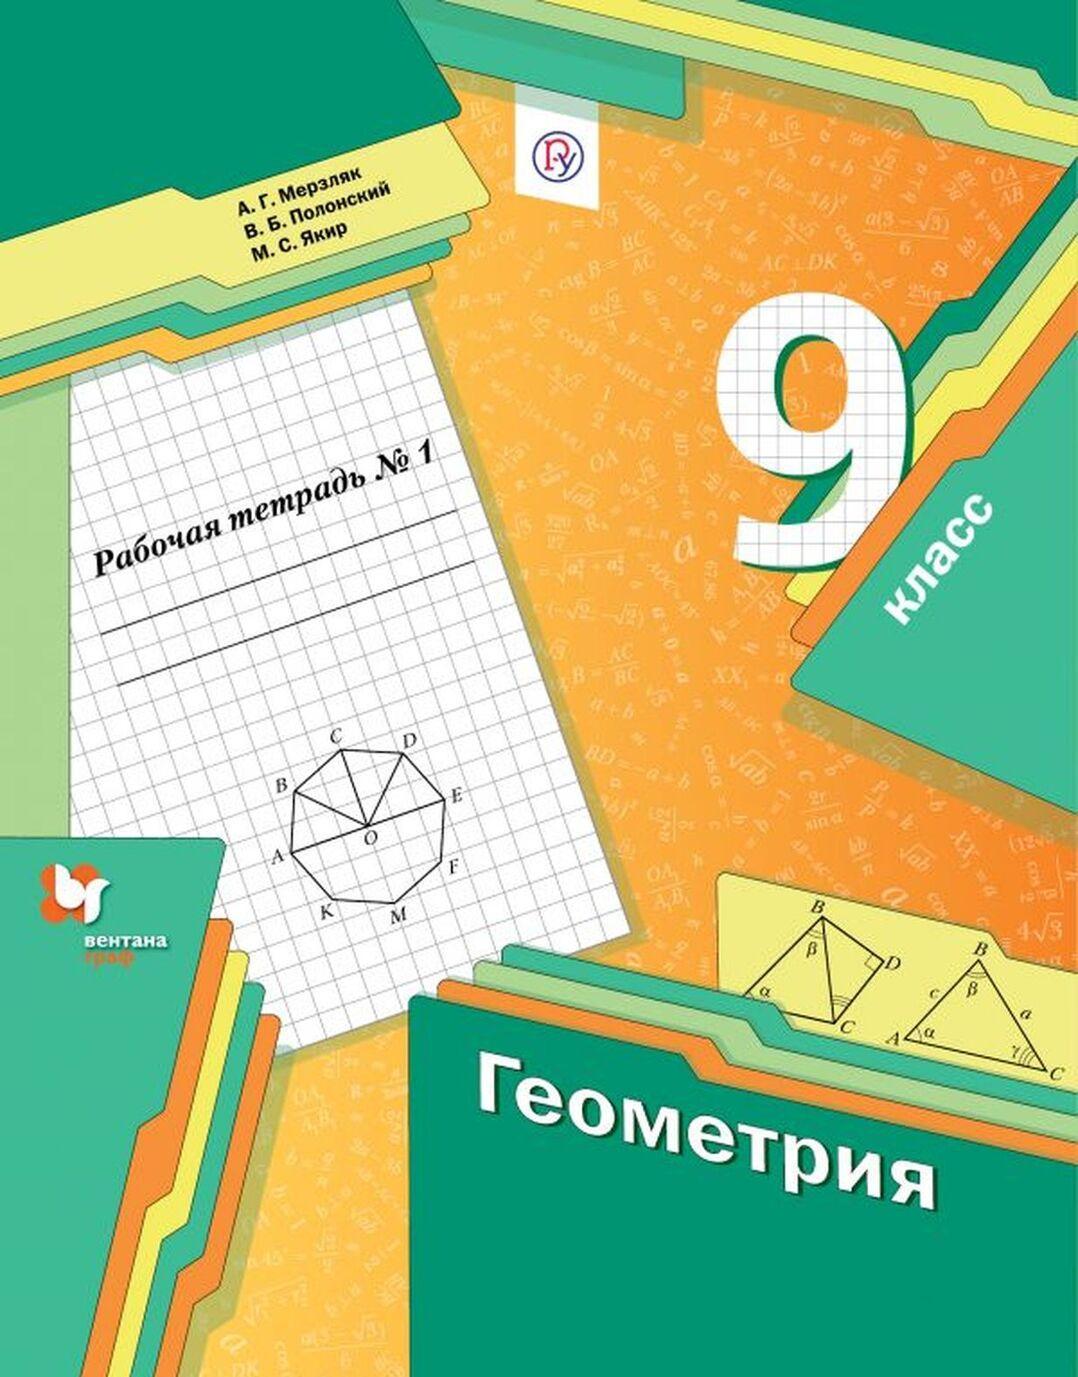 Geometrija. 9klass. Rabochaja tetrad № 1 | Merzljak Arkadij Grigorevich, Jakir Mikhail Semenovich